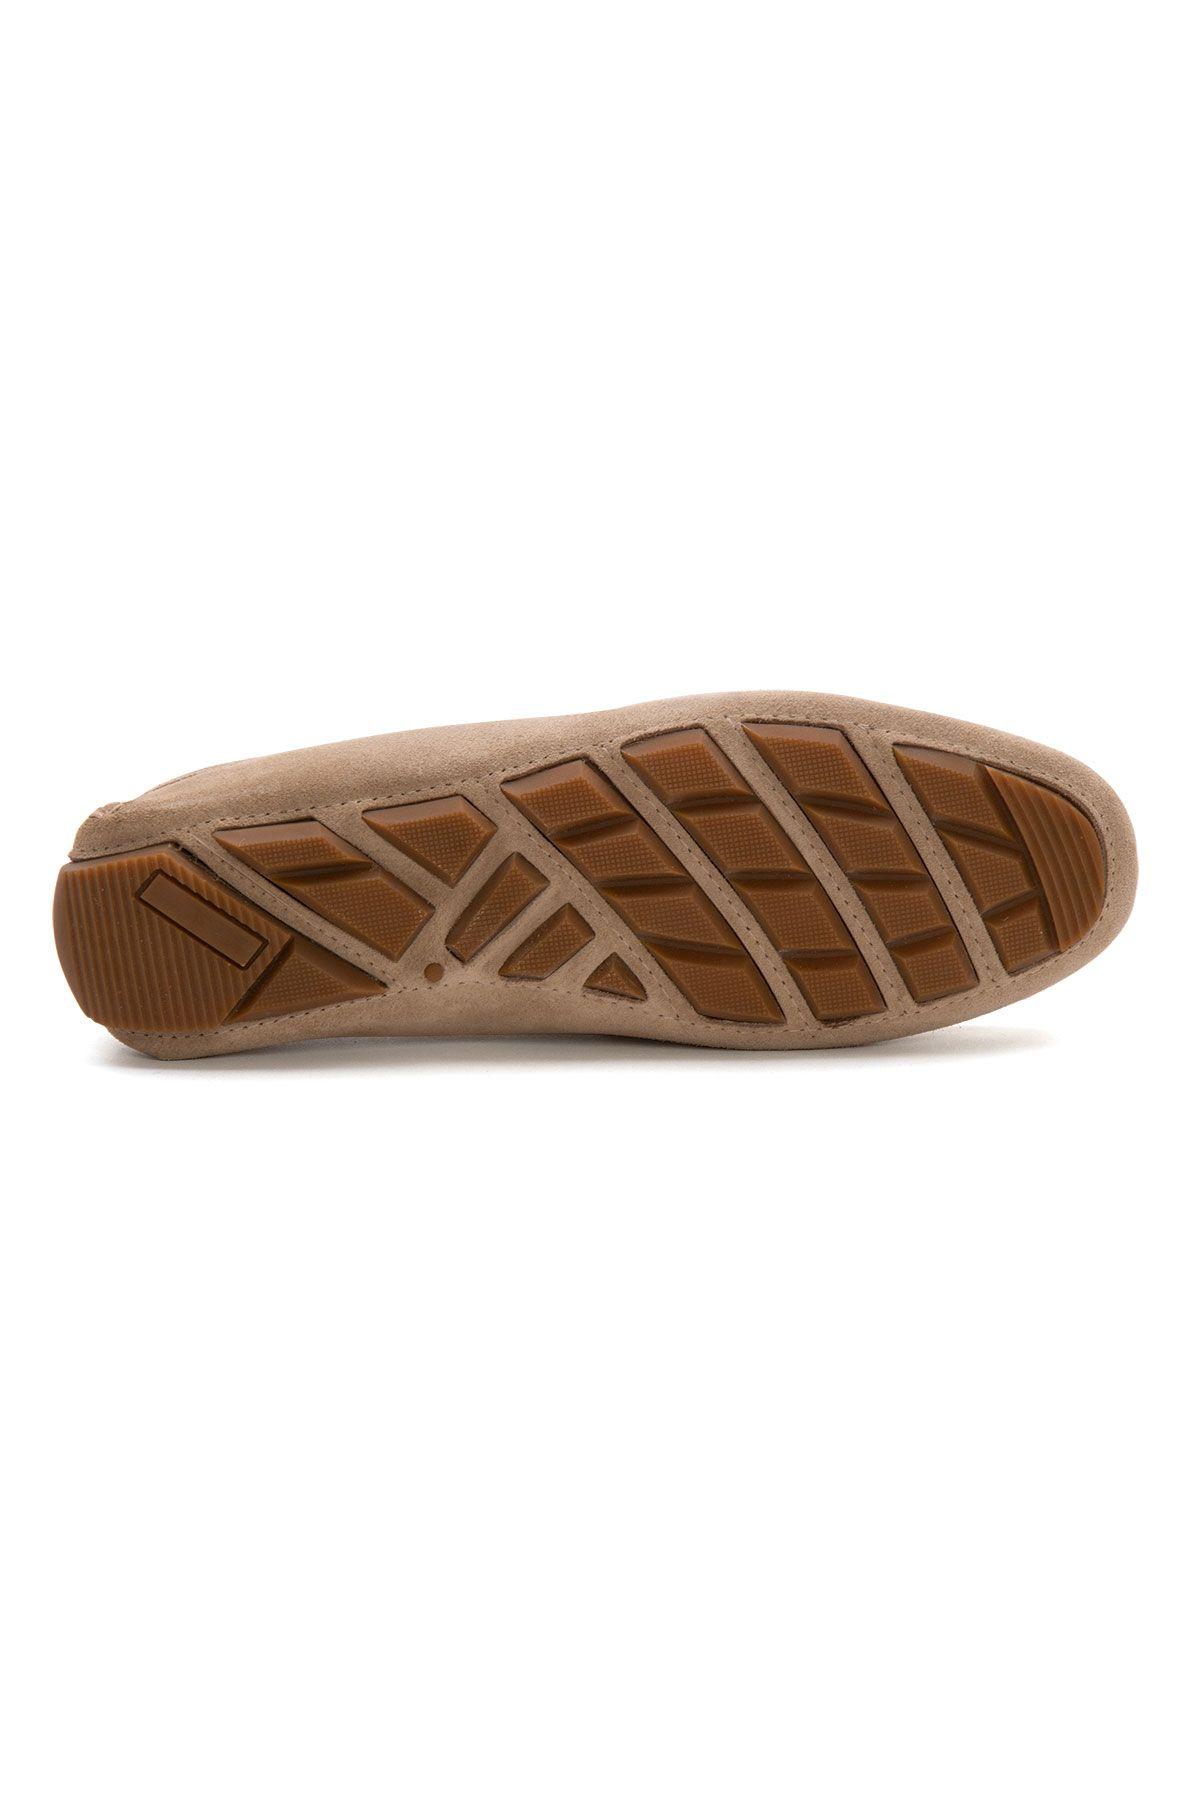 Pegia Genuine Suede Men's Loafer Shoes 500901 Beige